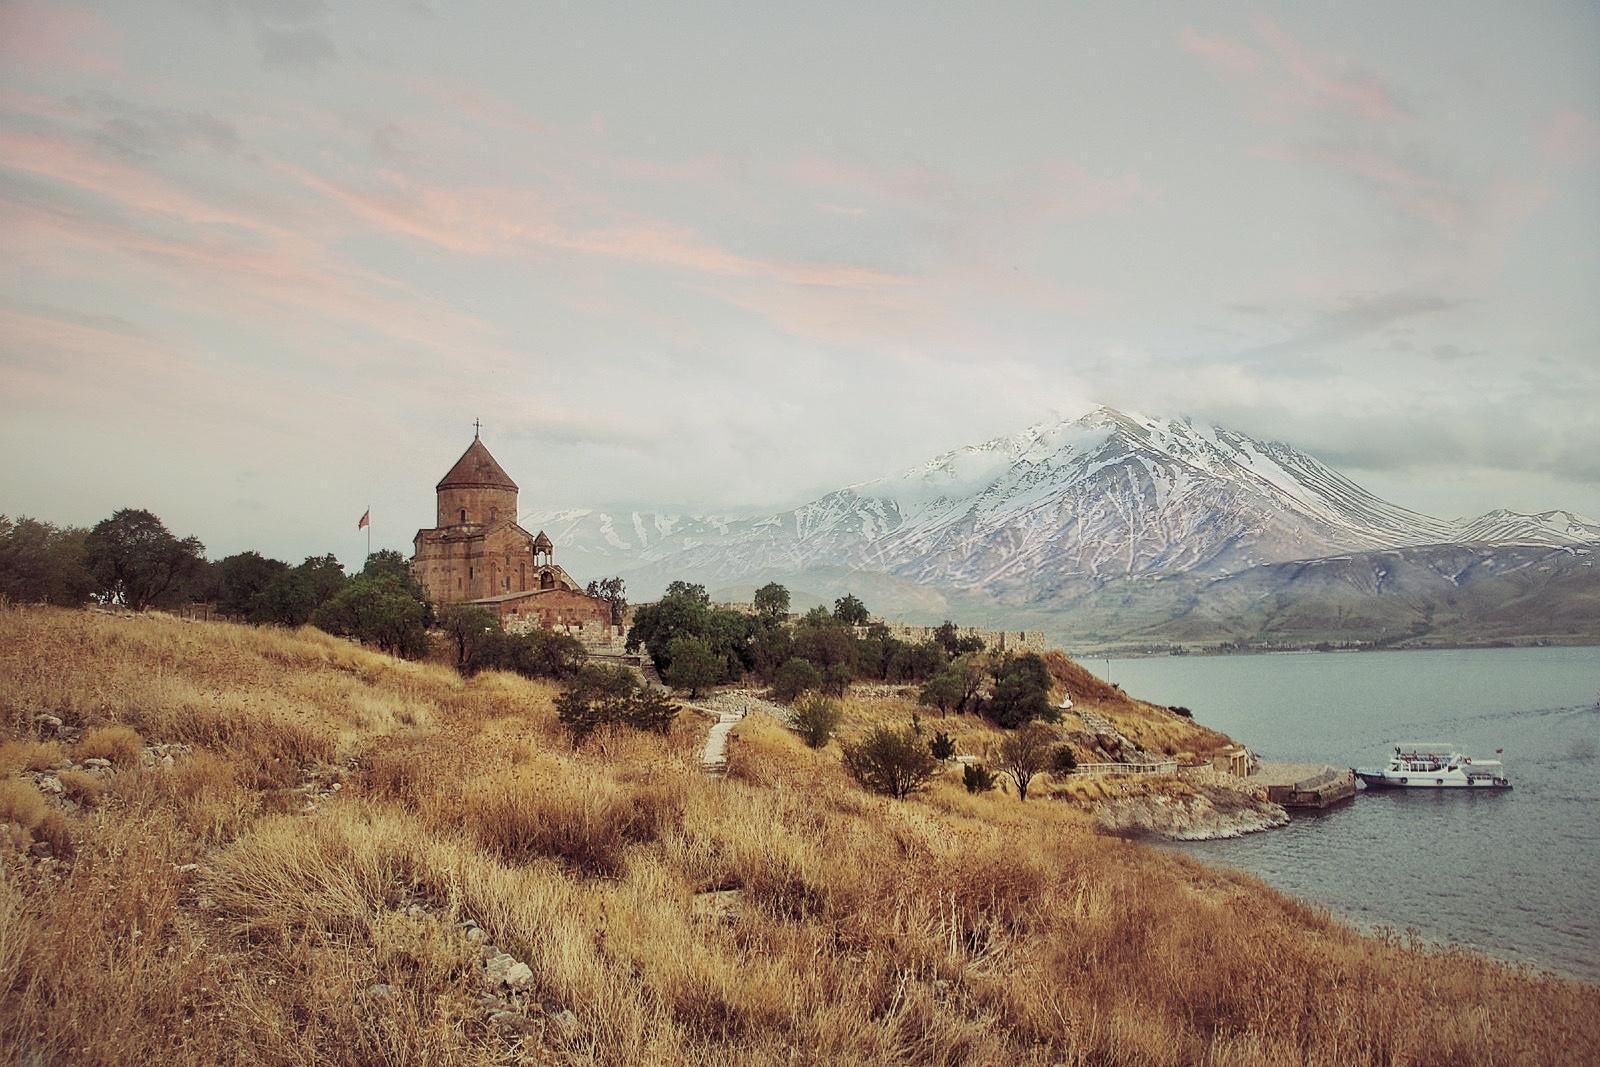 Akdamar Island and the Church